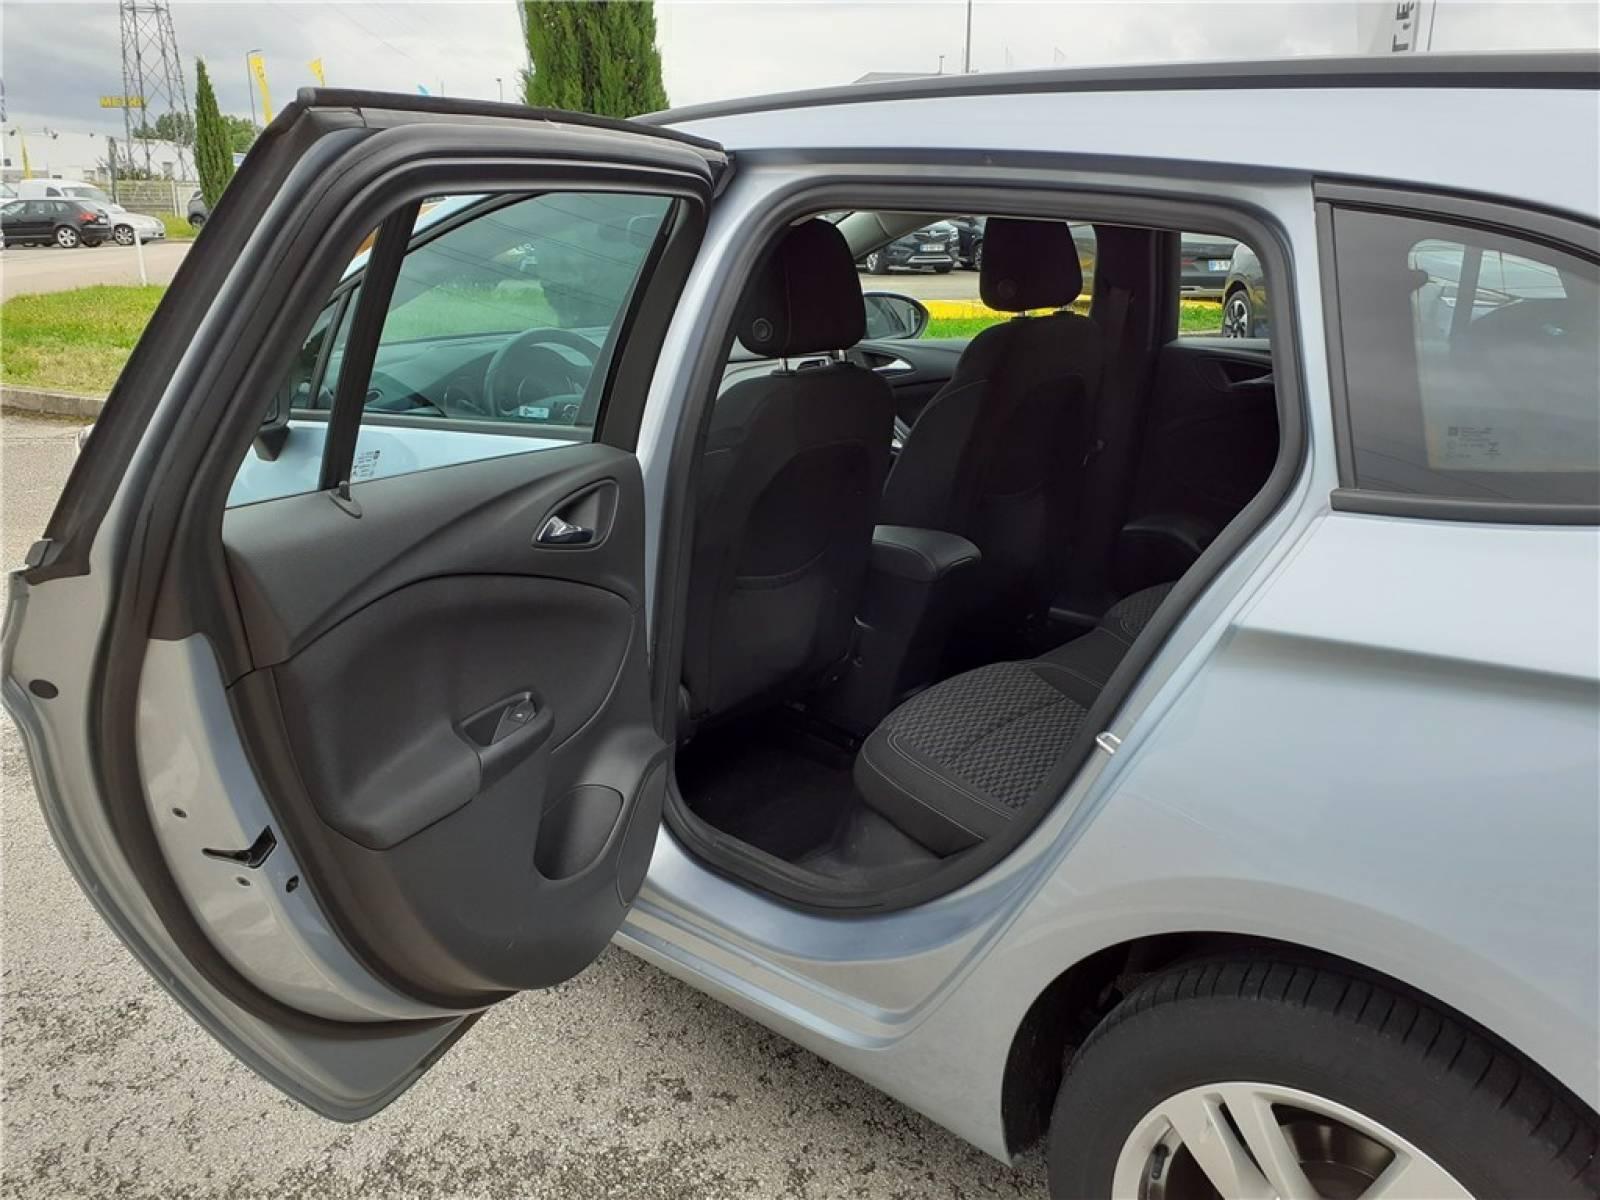 OPEL Astra Sports Tourer 1.6 CDTI 110 ch - véhicule d'occasion - Groupe Guillet - Opel Magicauto - Chalon-sur-Saône - 71380 - Saint-Marcel - 23